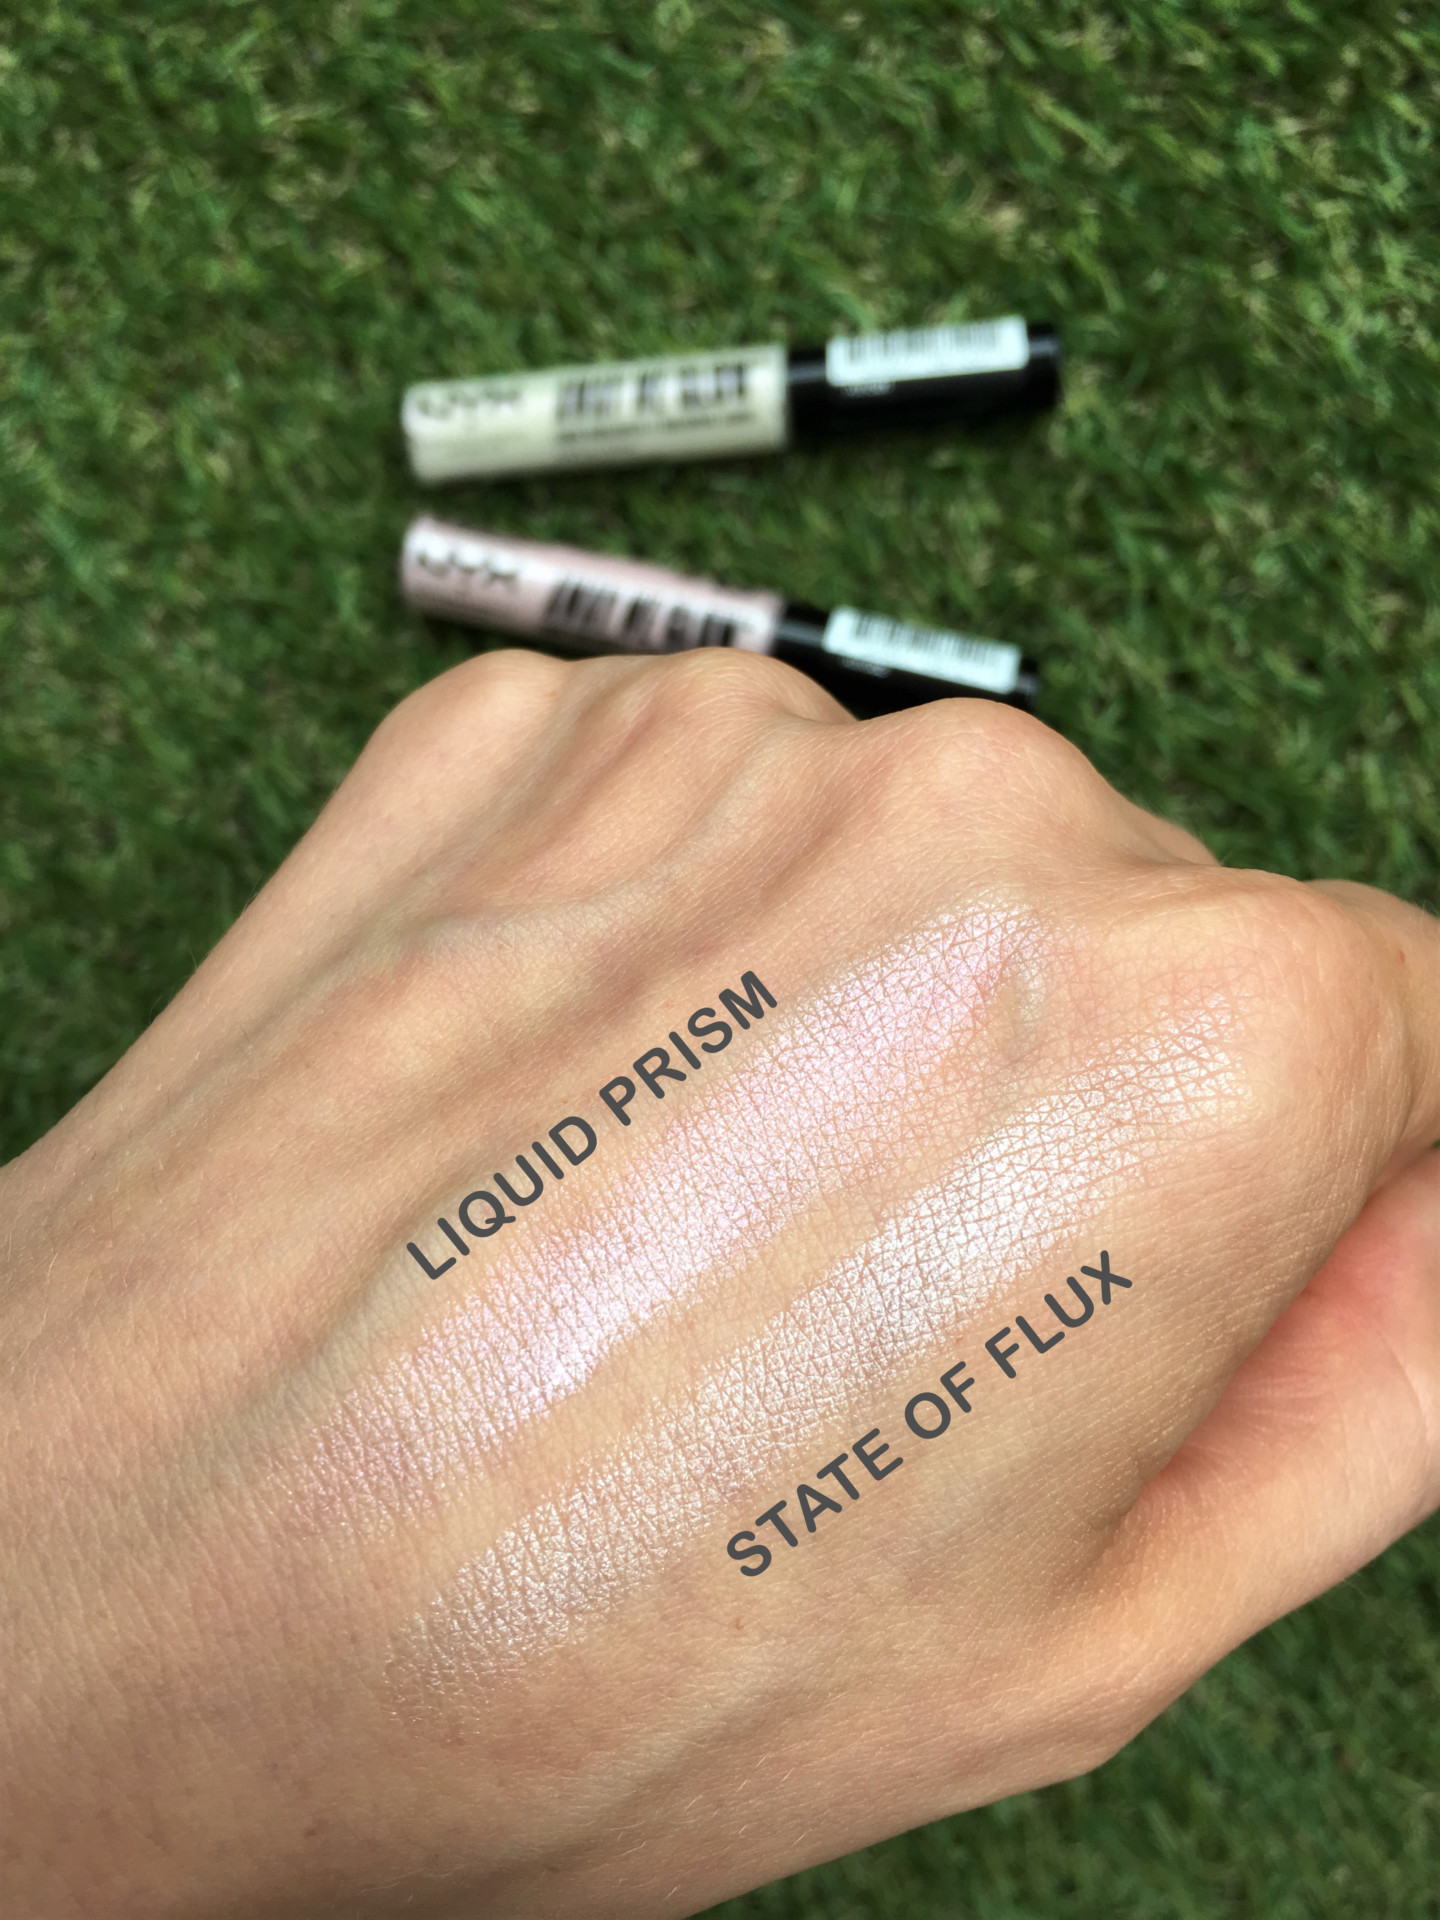 nyx_away_we_glow_highlighter_makeup_dbkstylez_хайлайтер_макияж_бьюти_блог